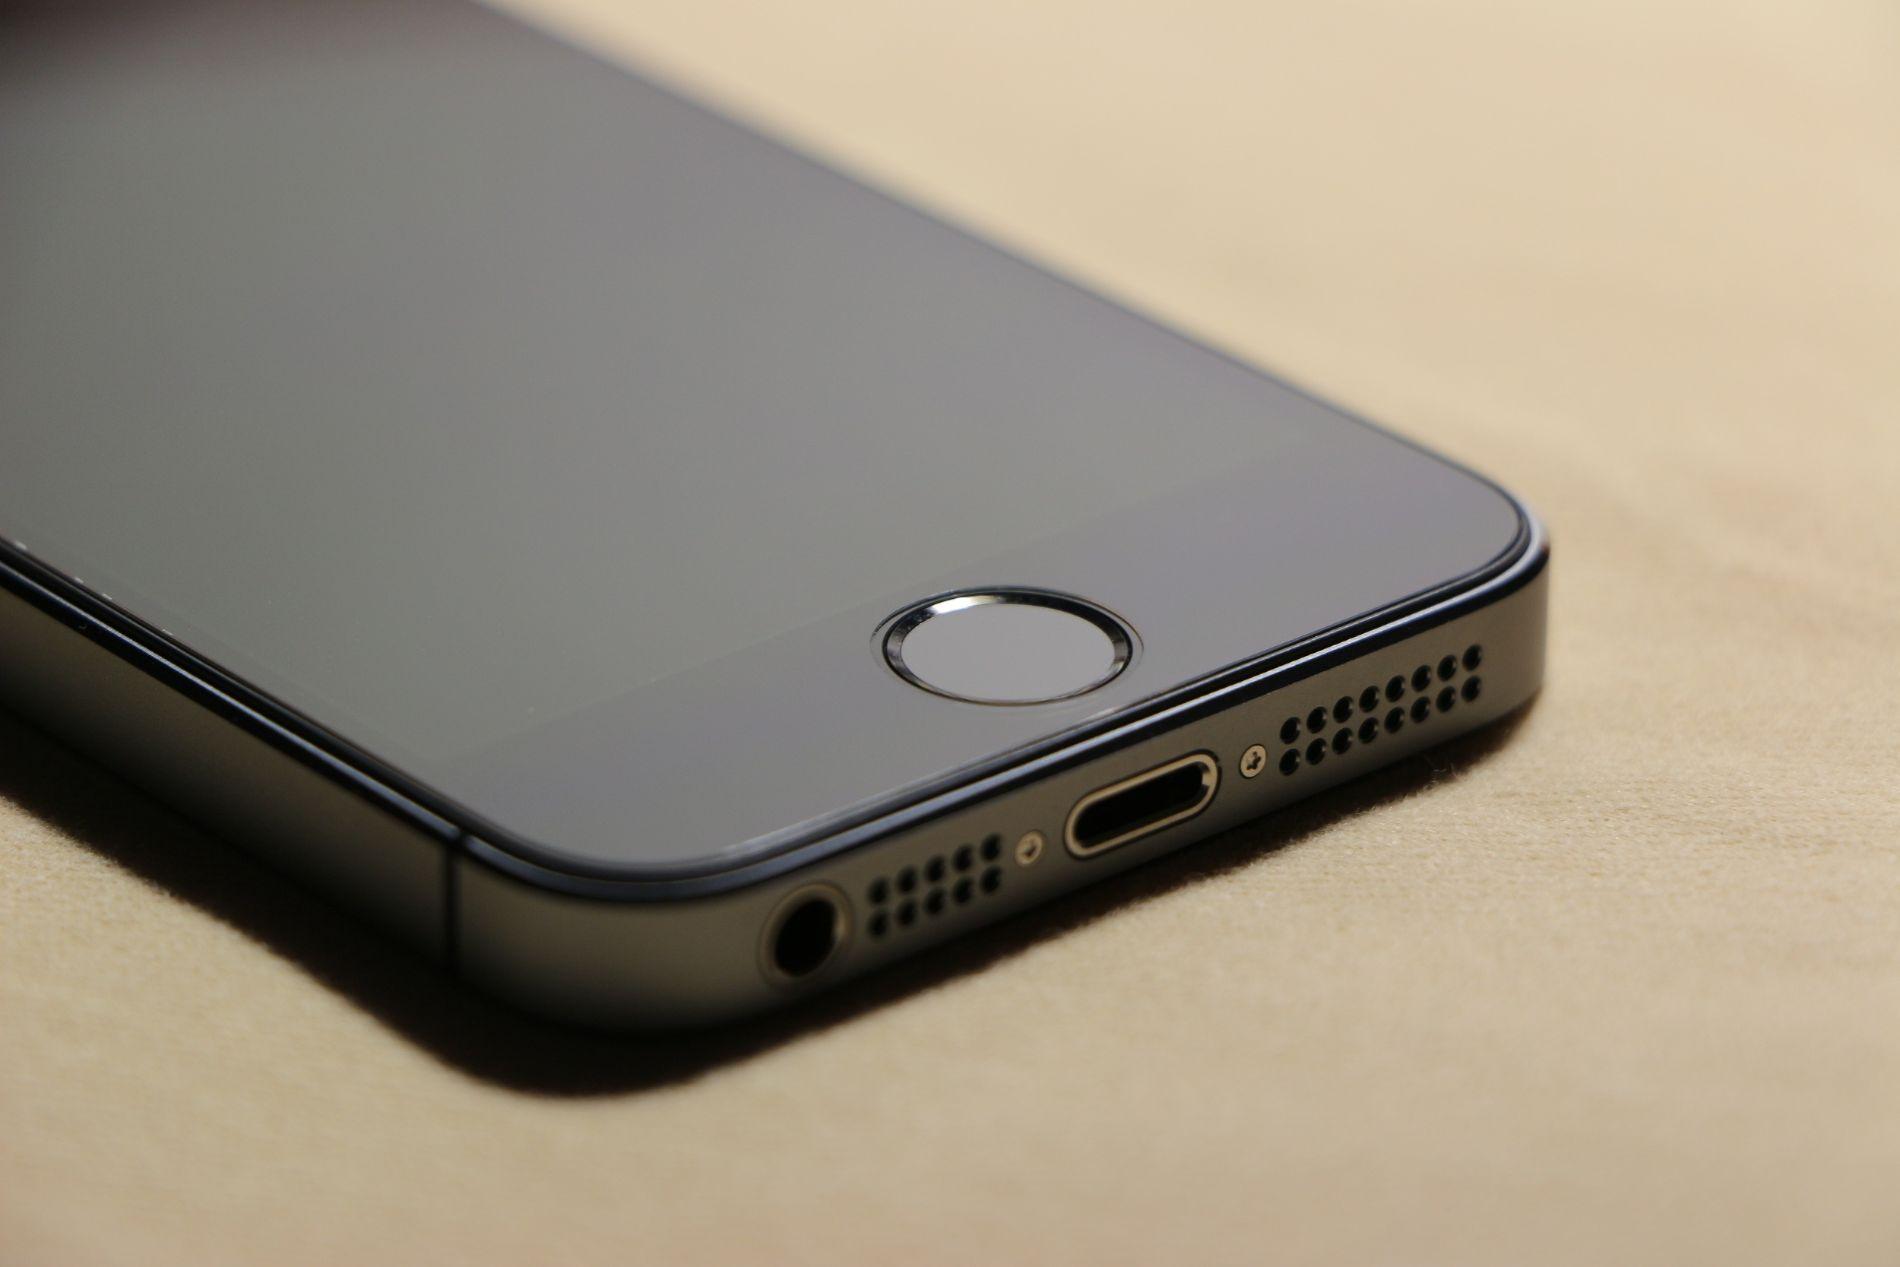 Apple получила патент на устройство с гибким экраном